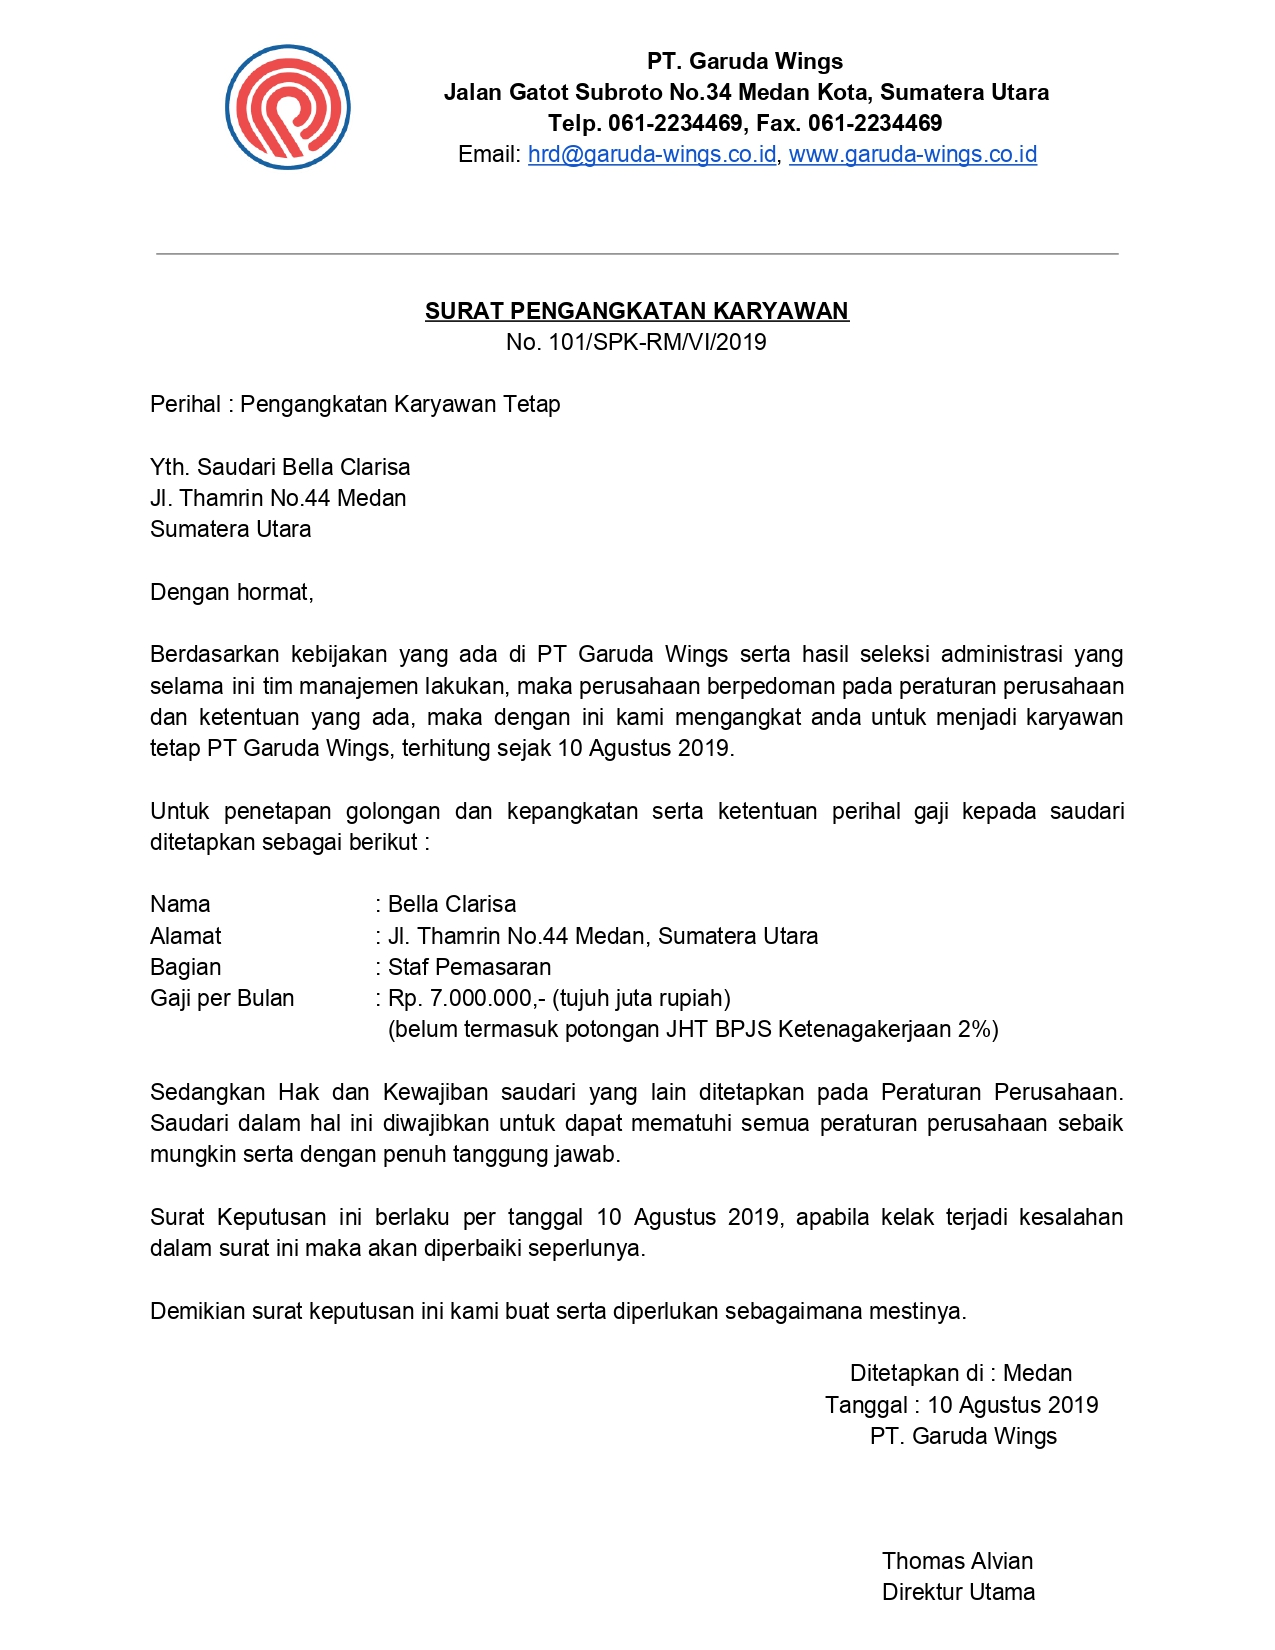 Contoh Surah Keterangan Karyawan Untuk Segala Keperluan - 001